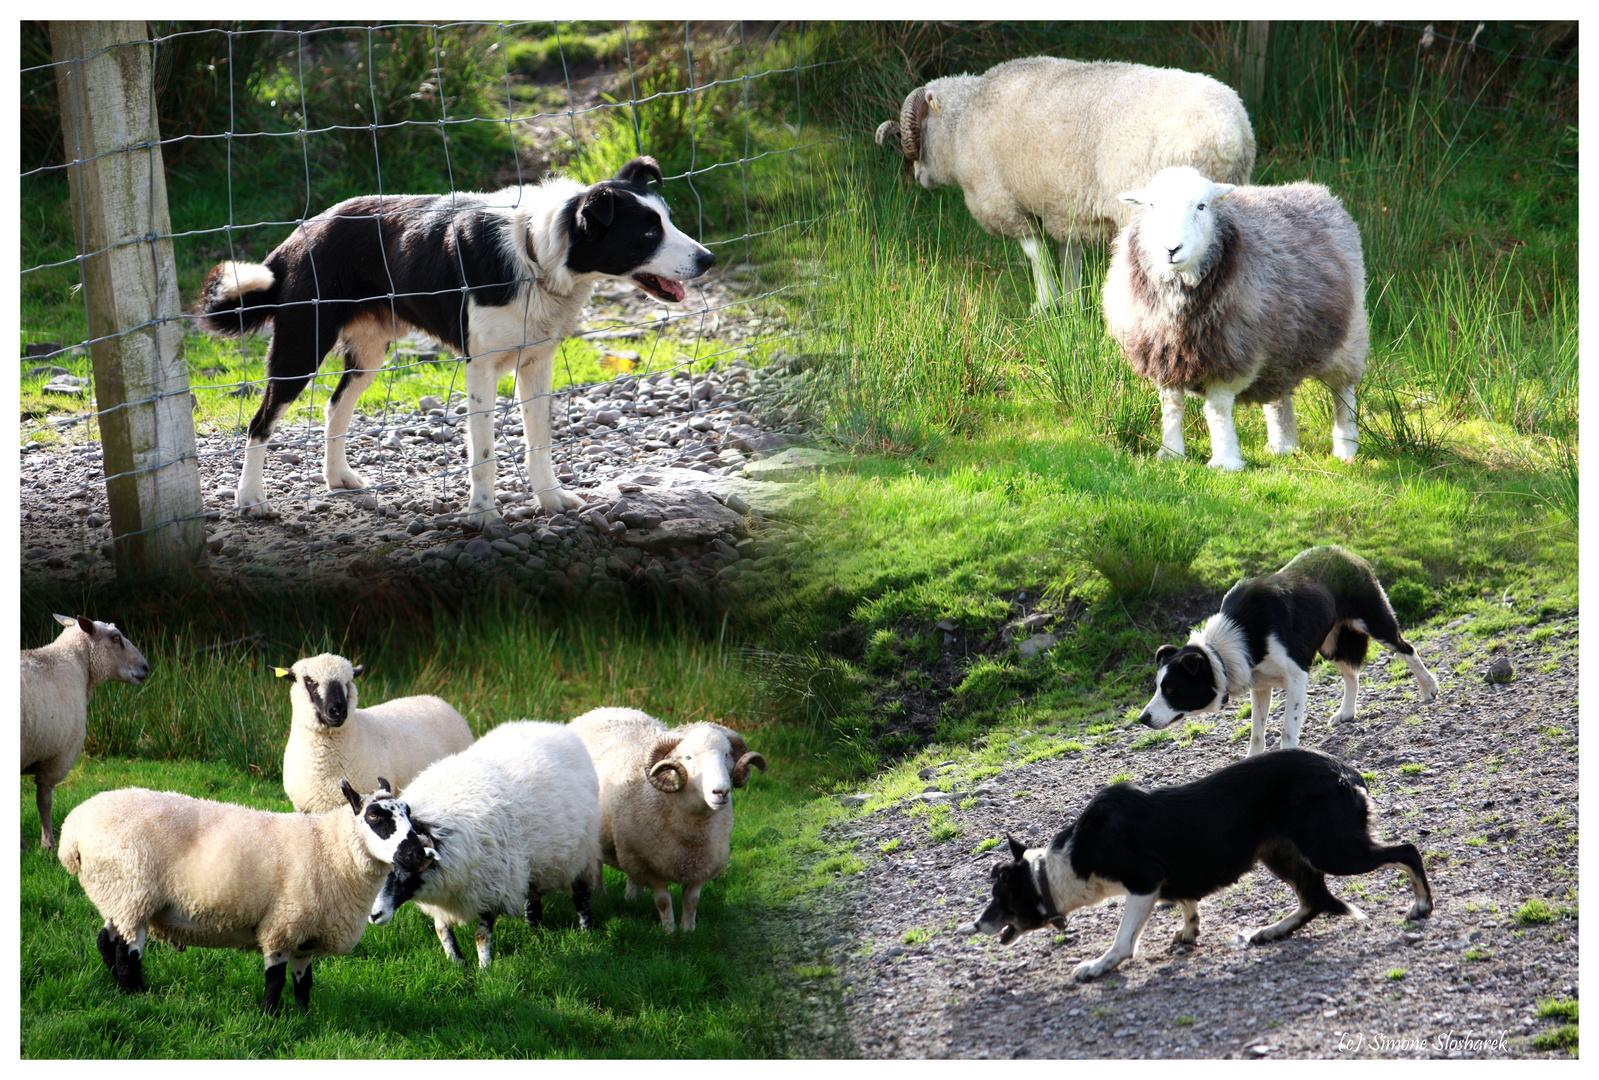 ~ Irland: Kells Sheep Farm ~